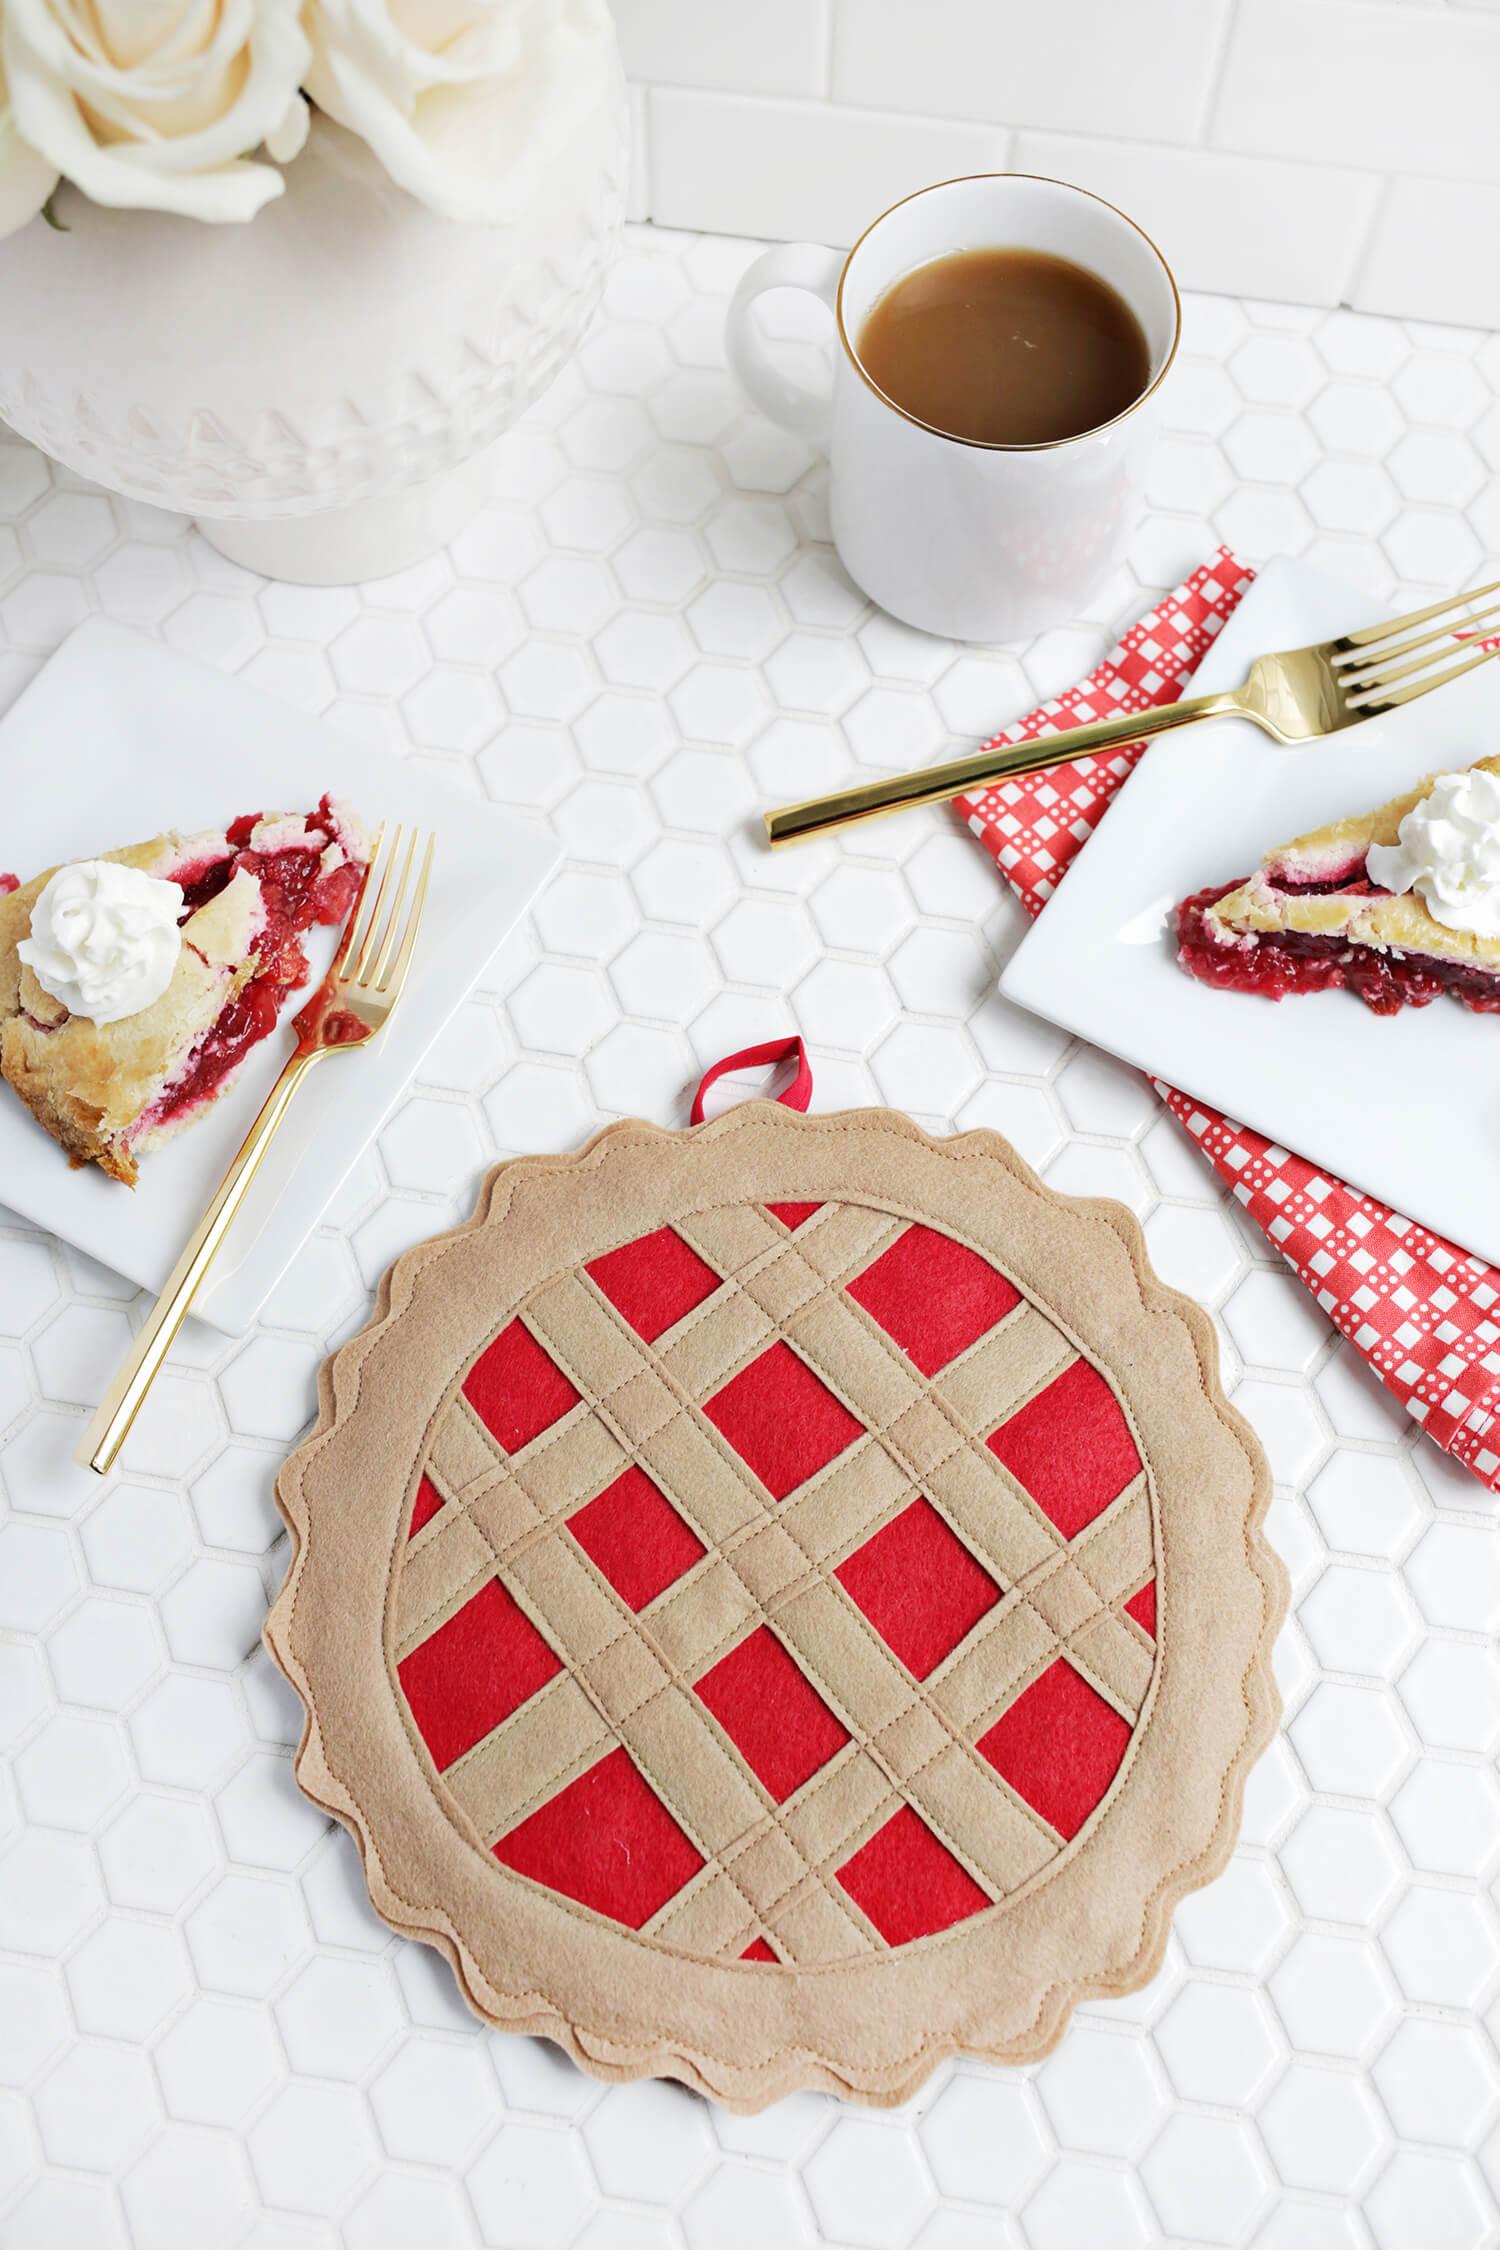 DIY colorful cherry pie potholder